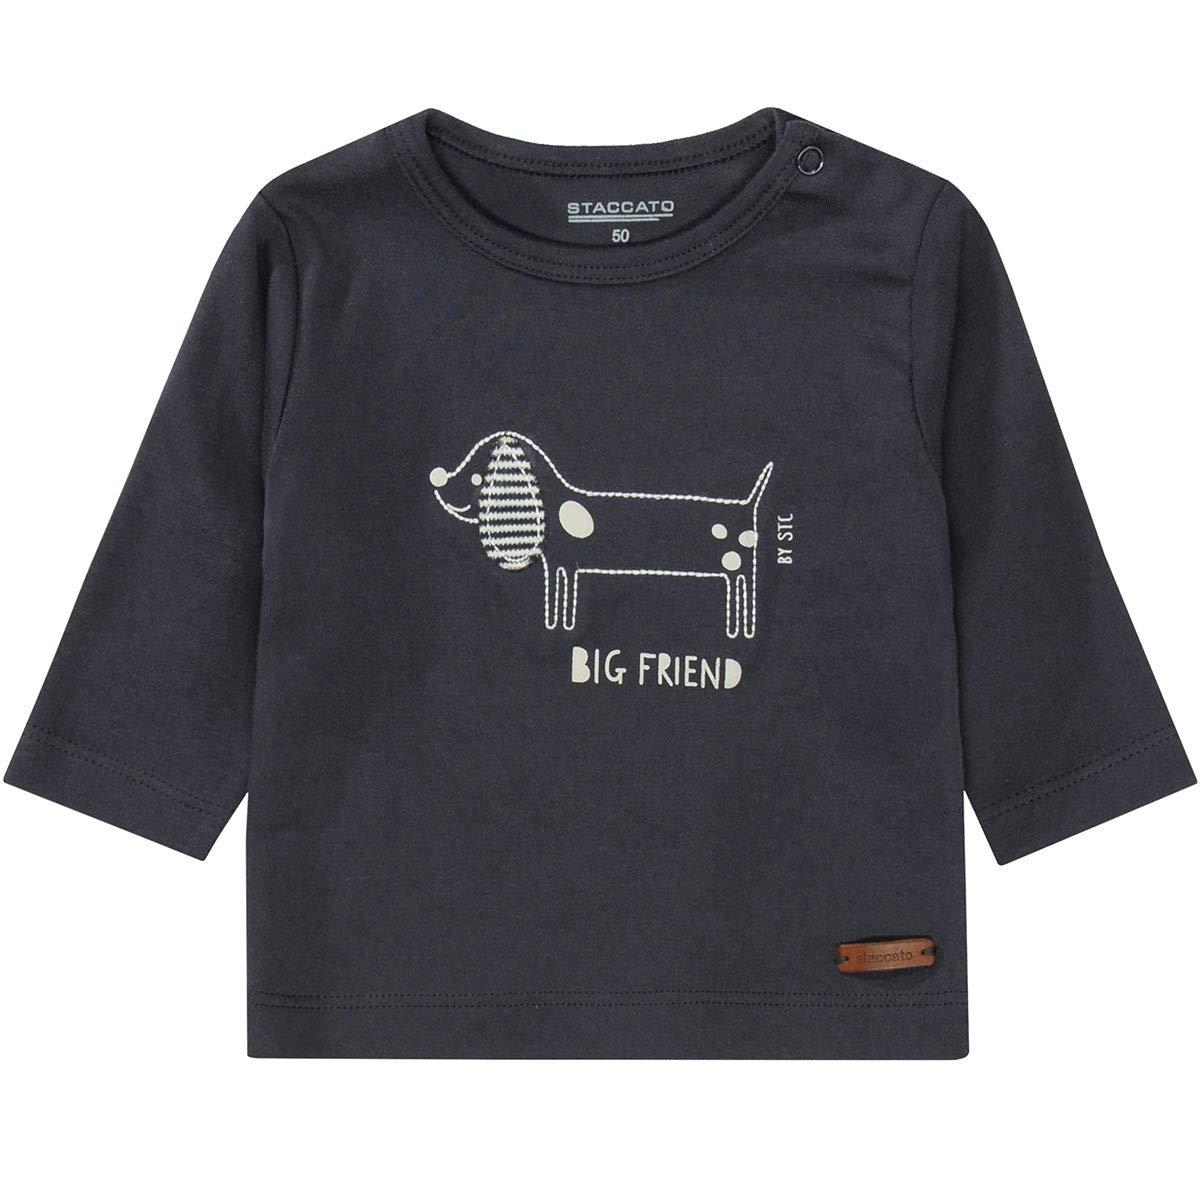 230072728 Staccato Jungen Organic Cotton Shirt Big Friend Soft Midnight